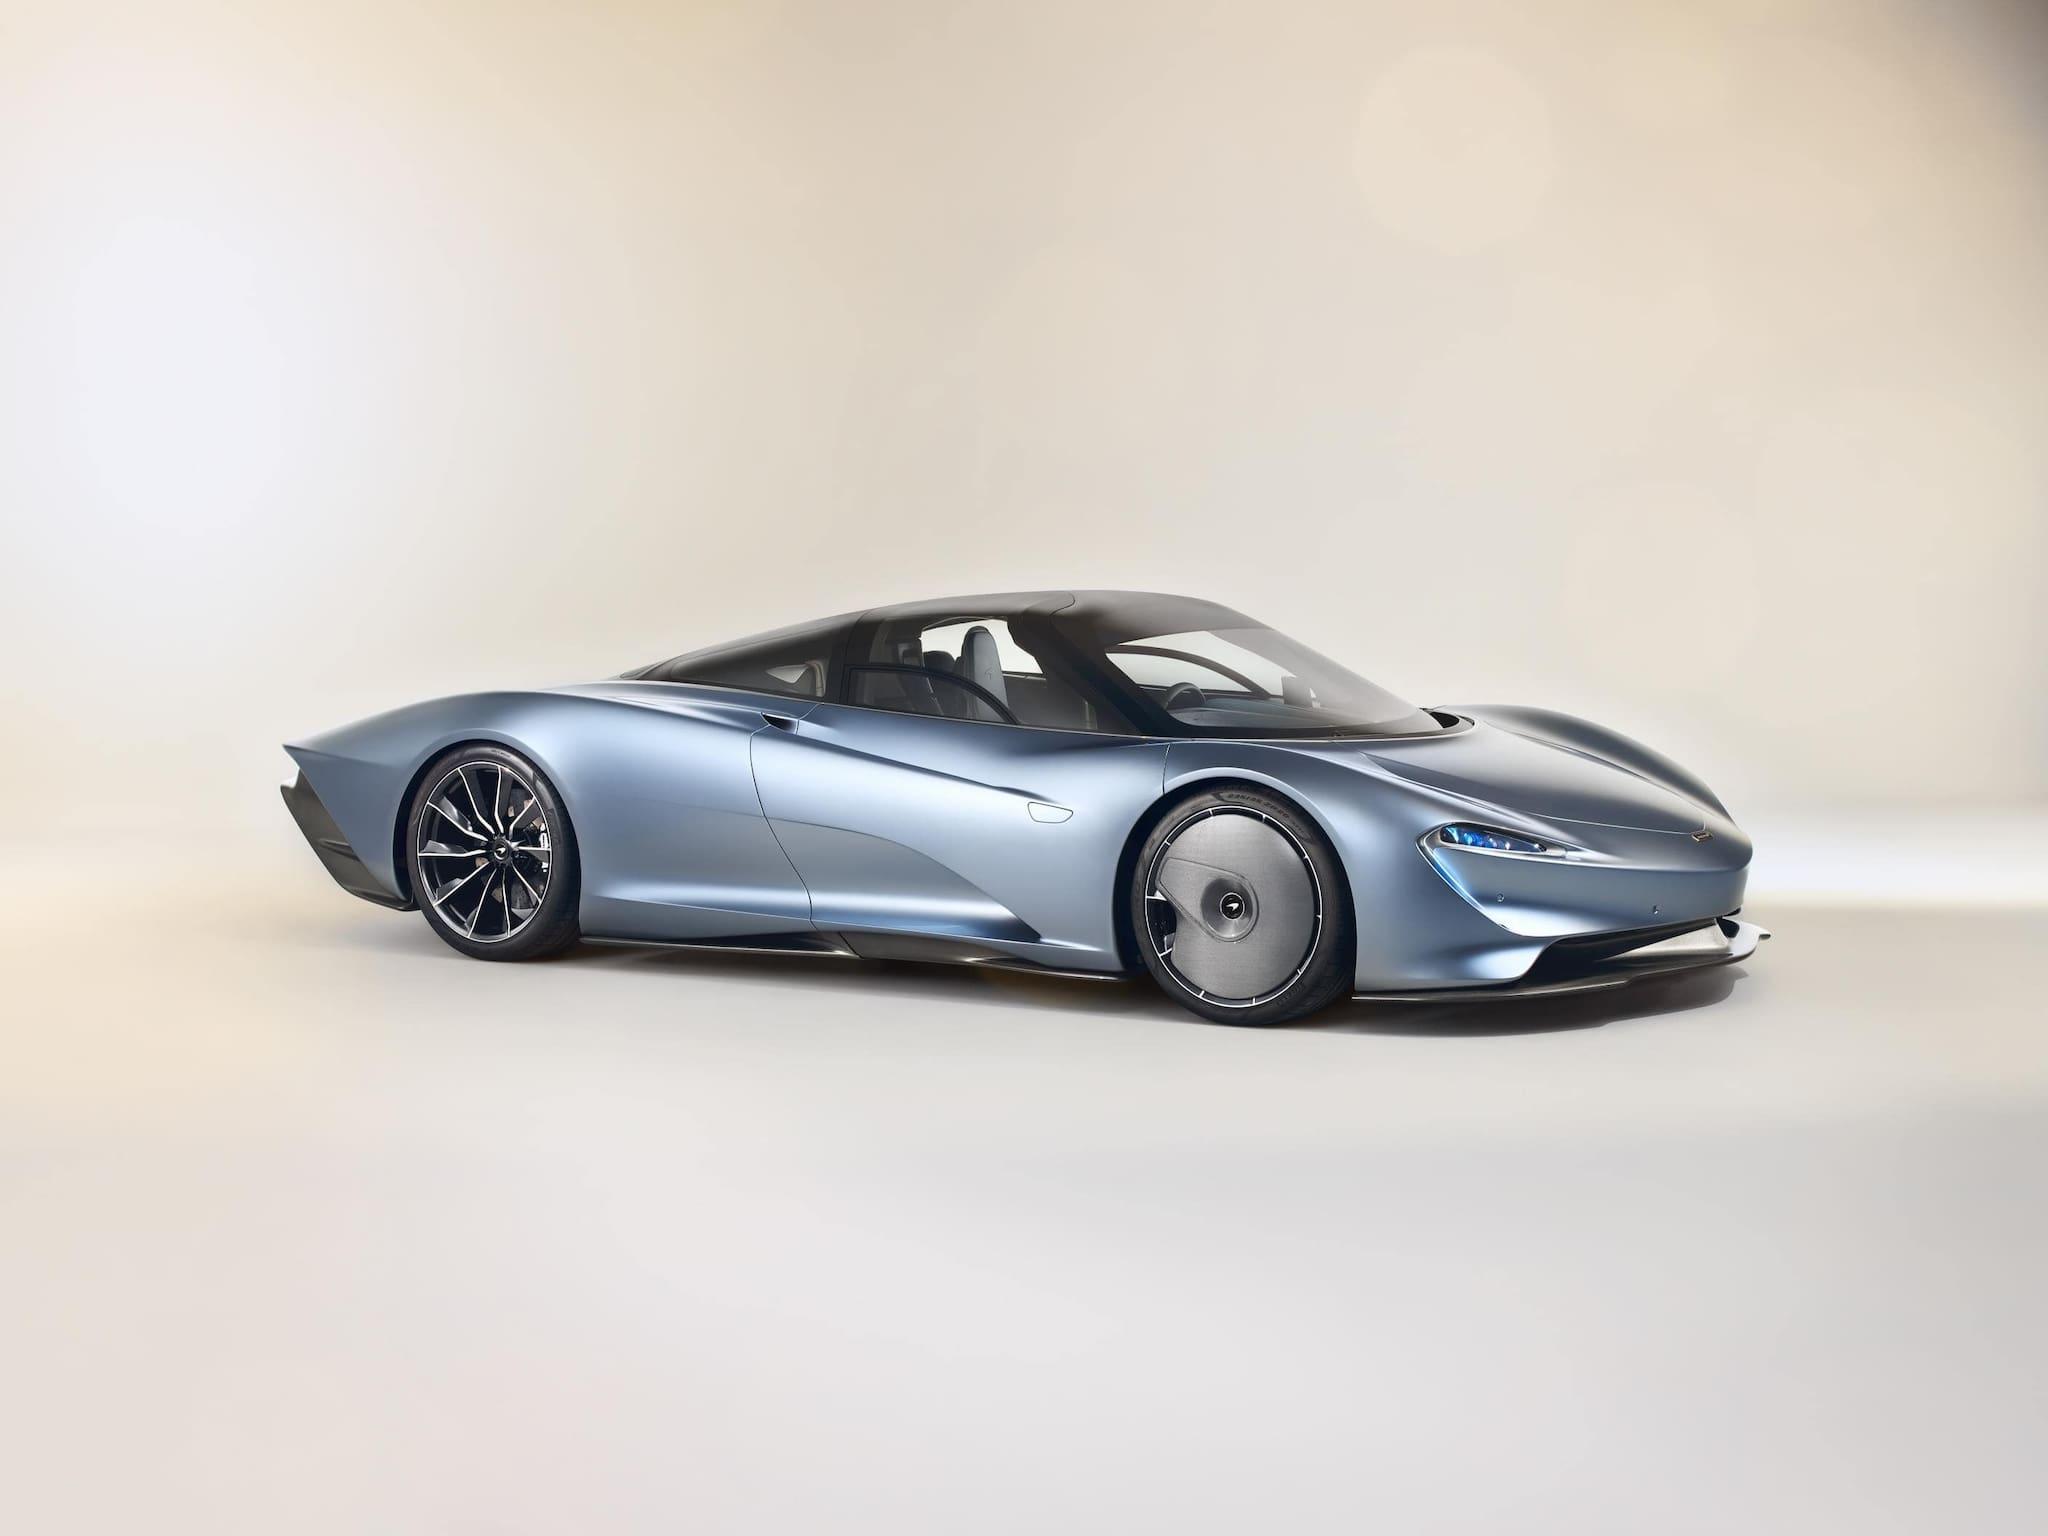 McLaren Finally Reveals First-Ever 'Hyper-GT' in McLaren Speedtail